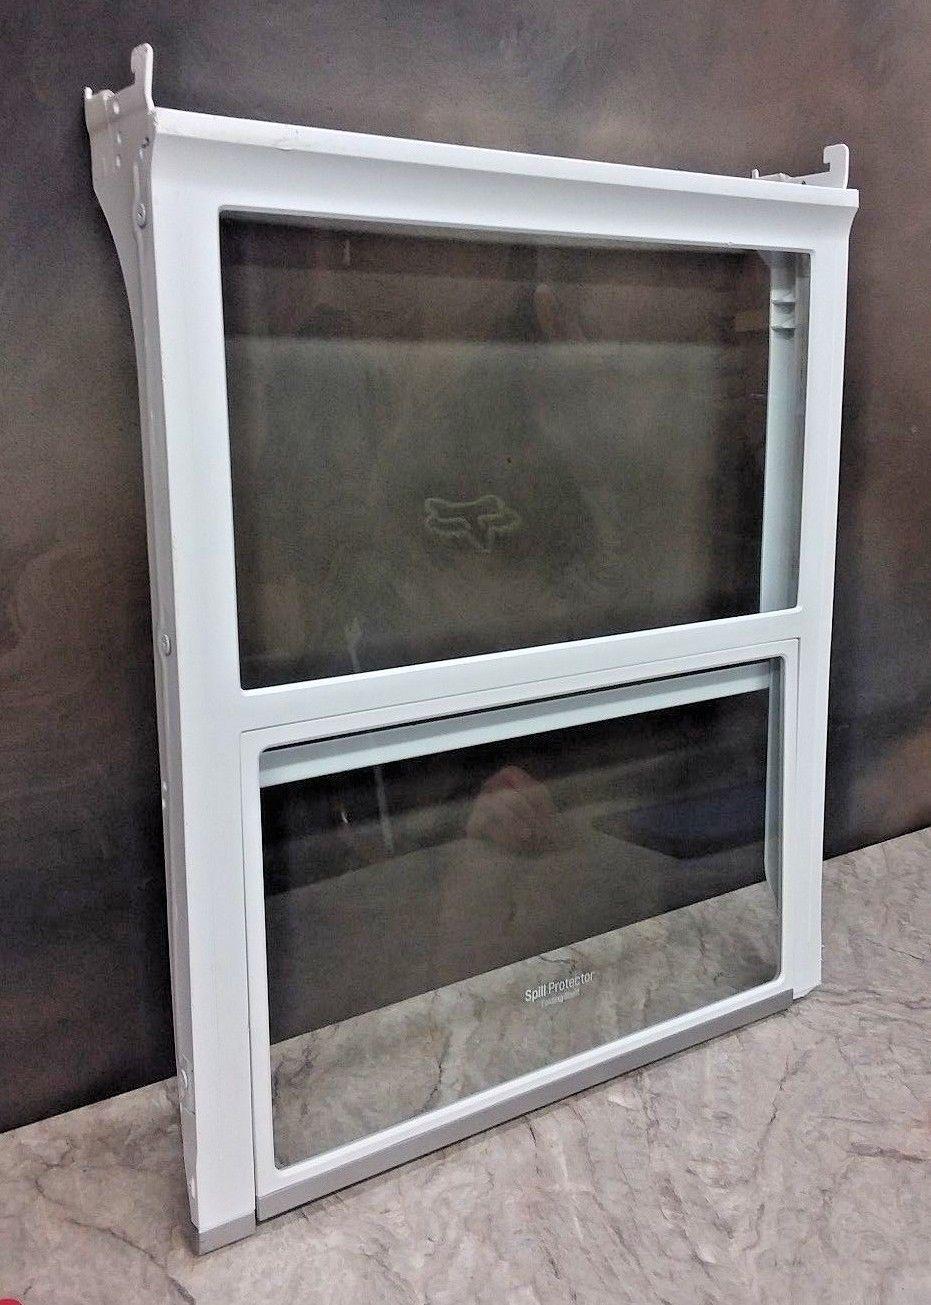 Strange Aht73234037 Lg Refrigerator Glass Folding Shelf Products Download Free Architecture Designs Salvmadebymaigaardcom